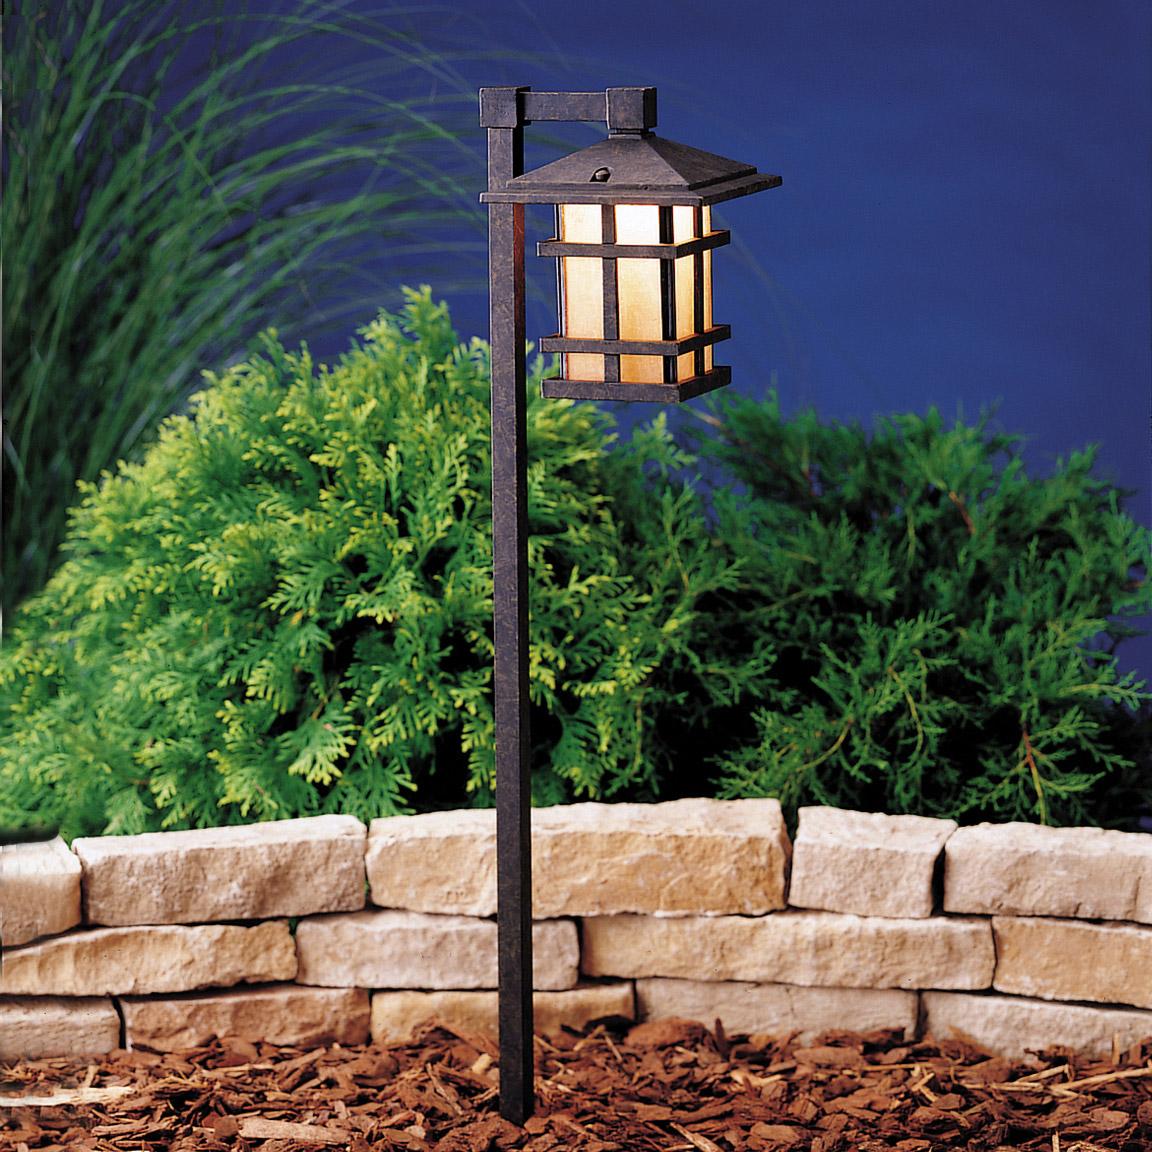 Kichler Landscape Lighting Distributors : Kichler agz cross creek v path spread light